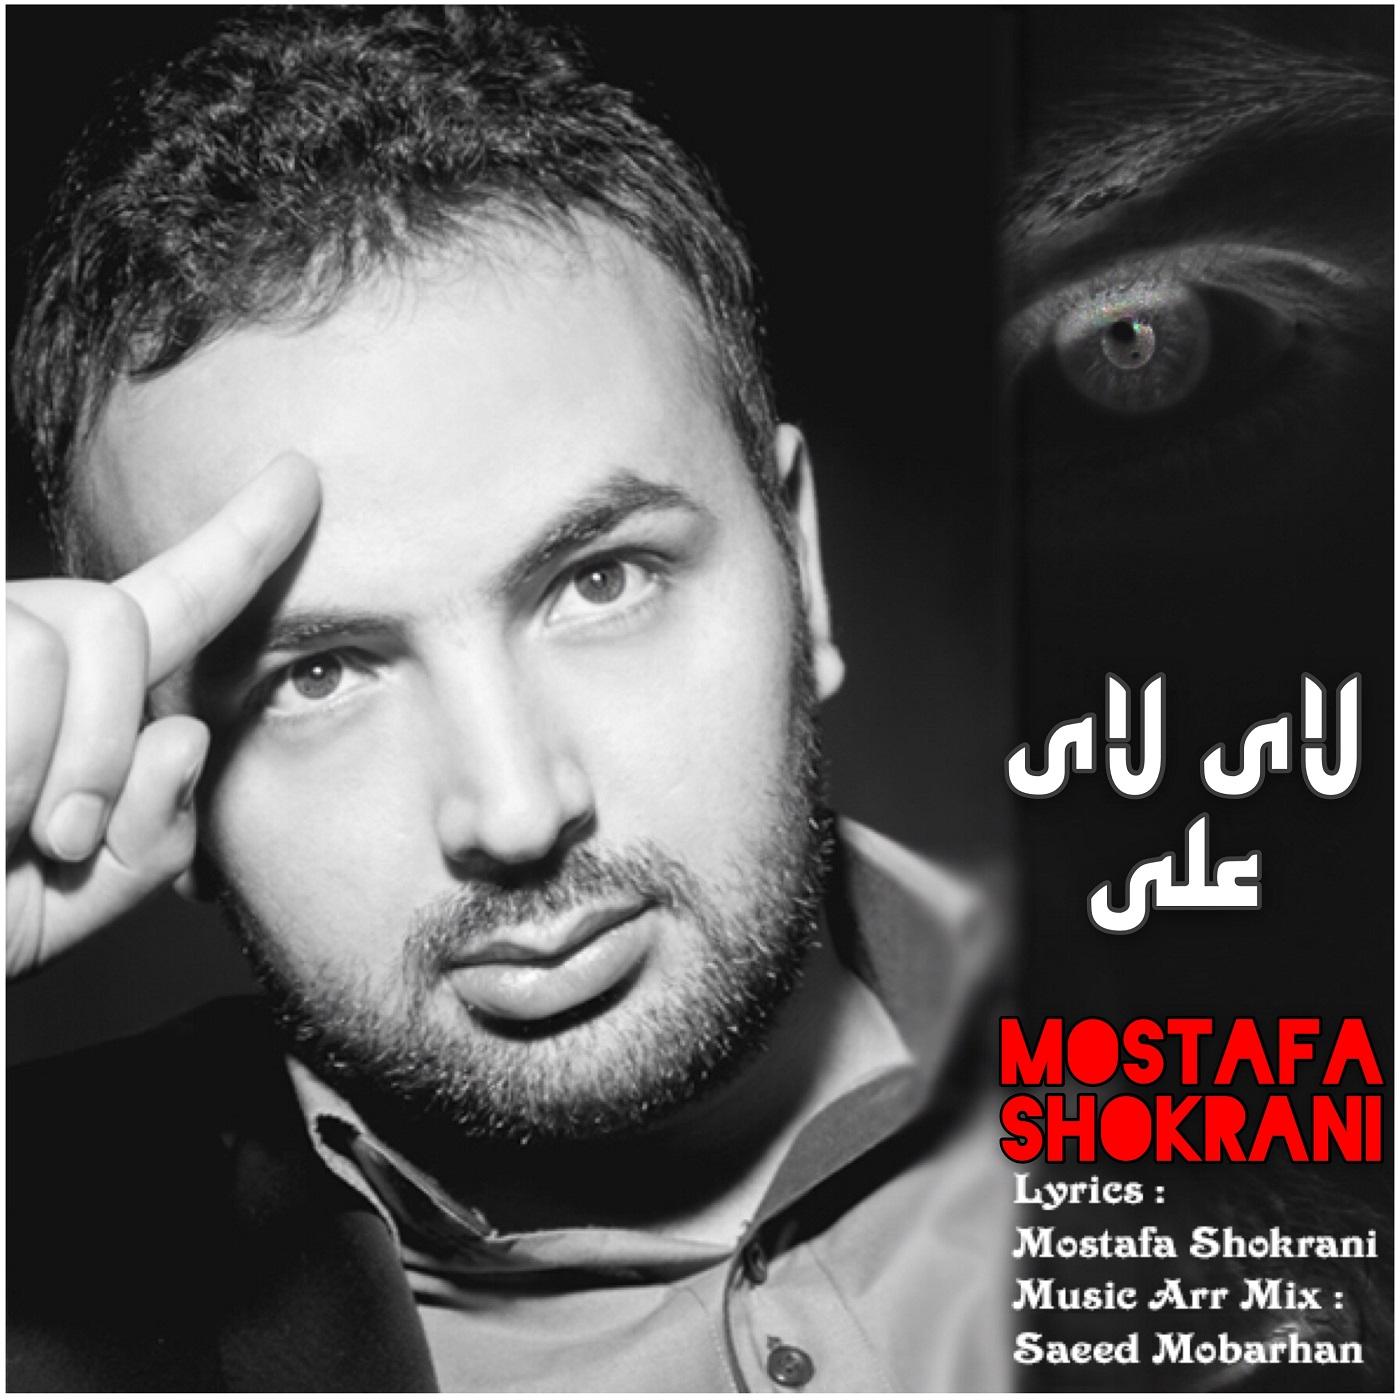 http://s6.picofile.com/file/8375640168/16Mostafa_Shokrani_Lay_Lay_Ali.jpg